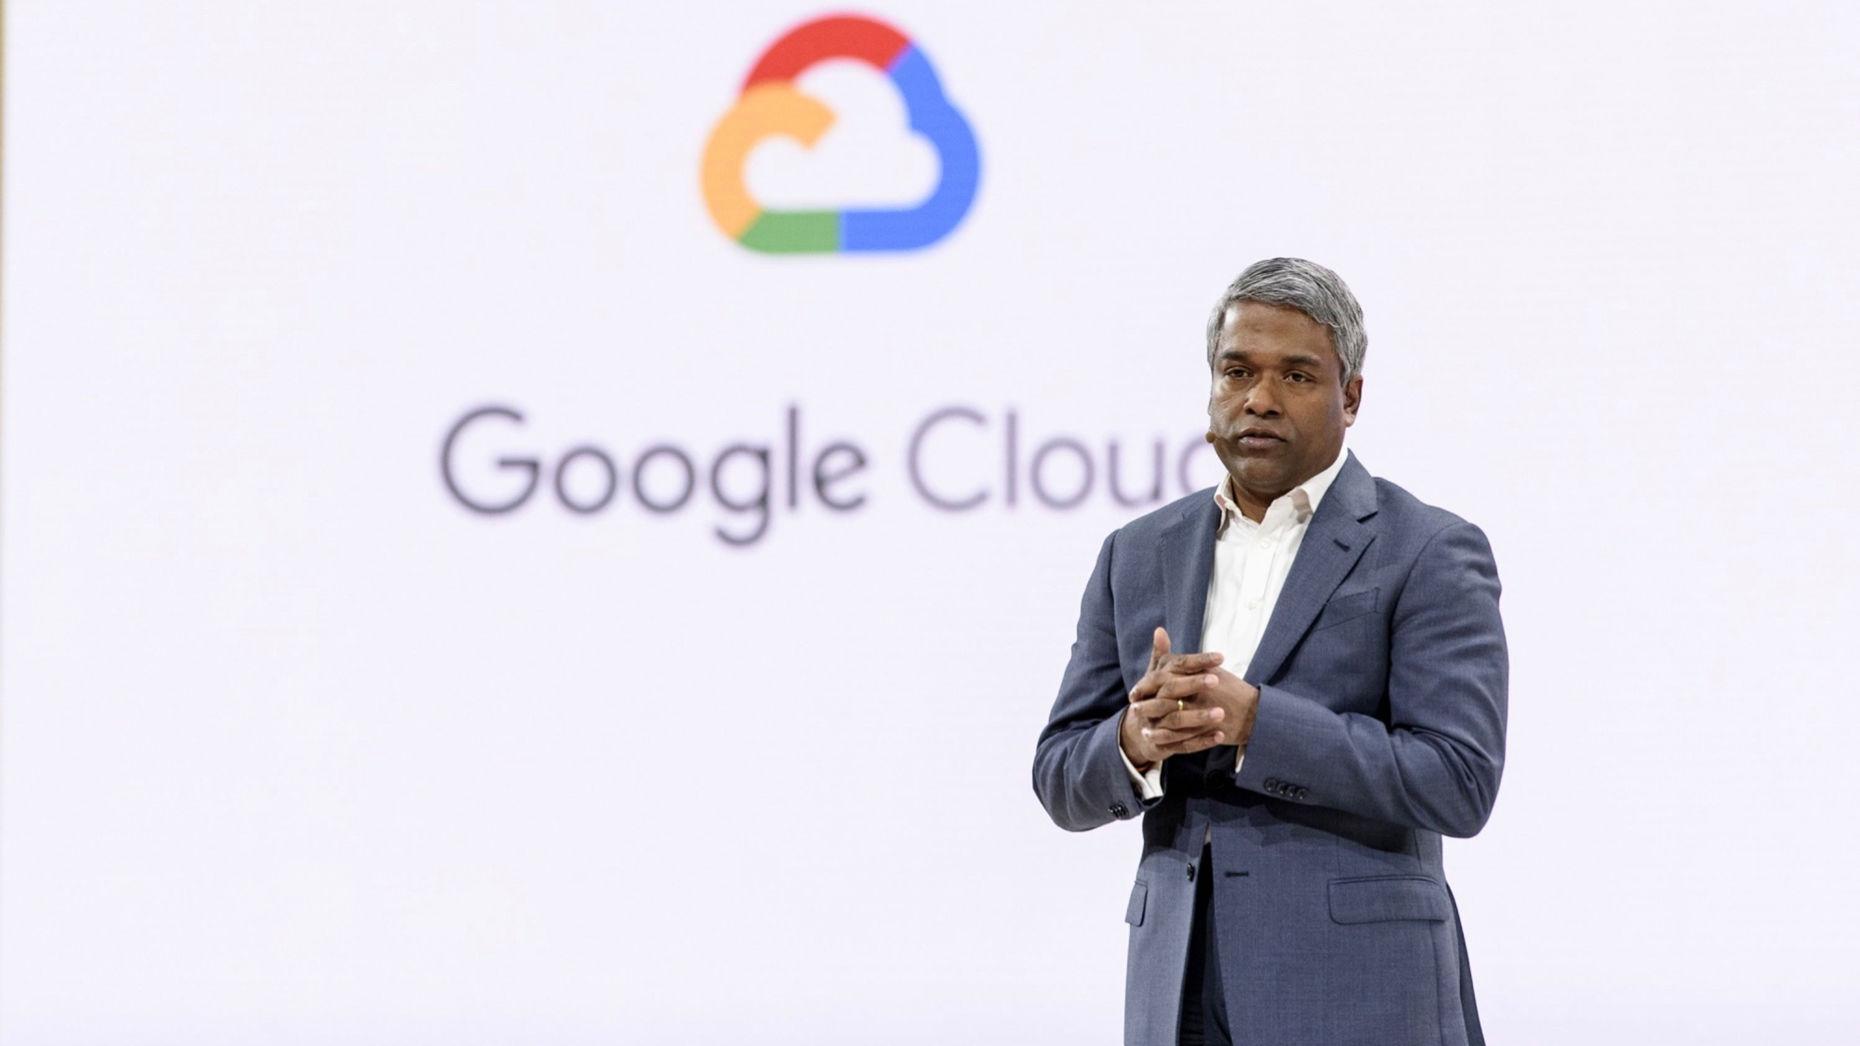 Google Cloud CEO Thomas Kurian. Photo by Bloomberg